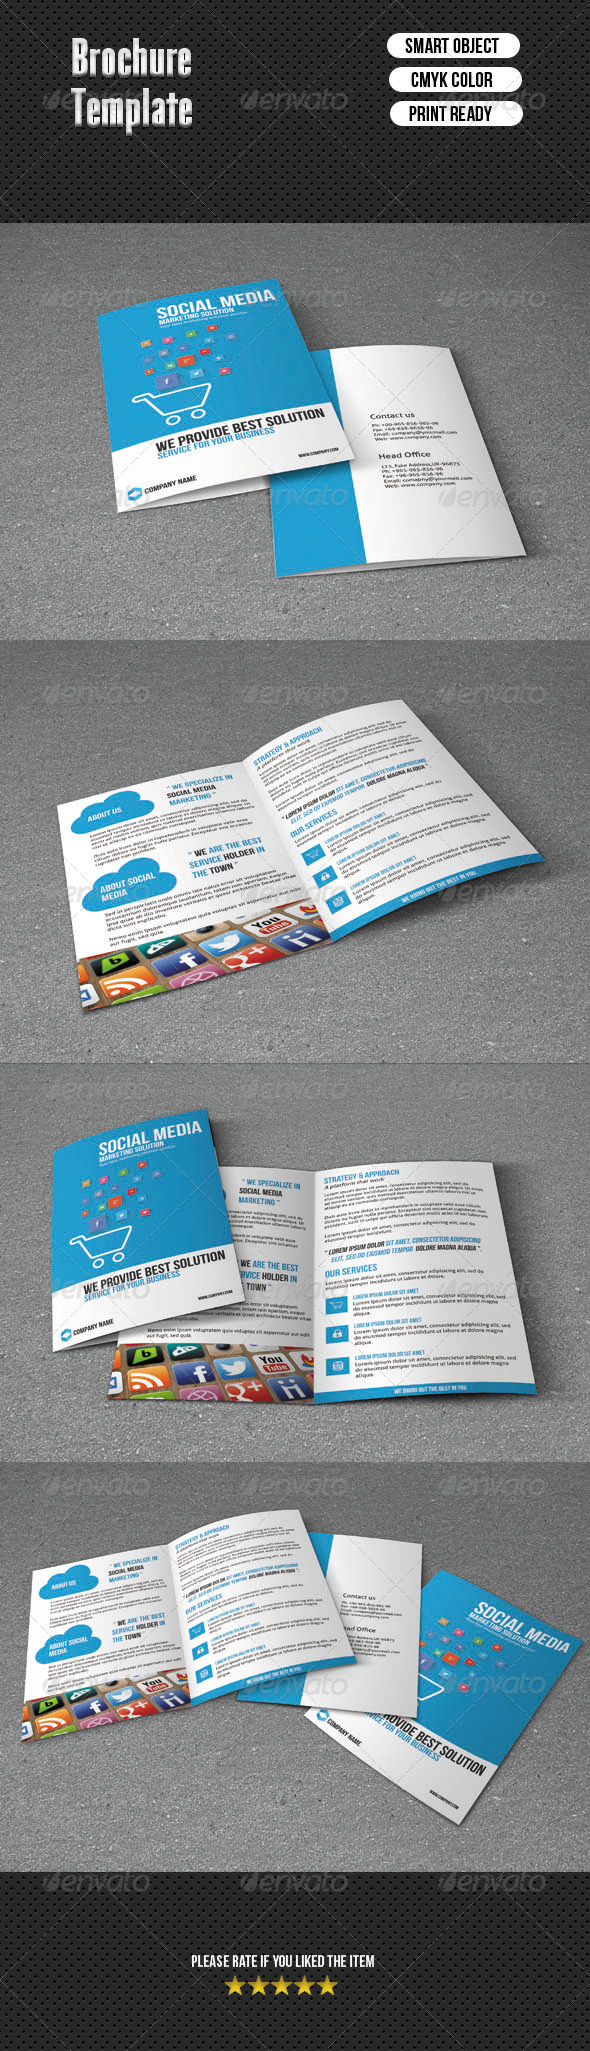 Social Media Marketing Brochure - Corporate Brochures